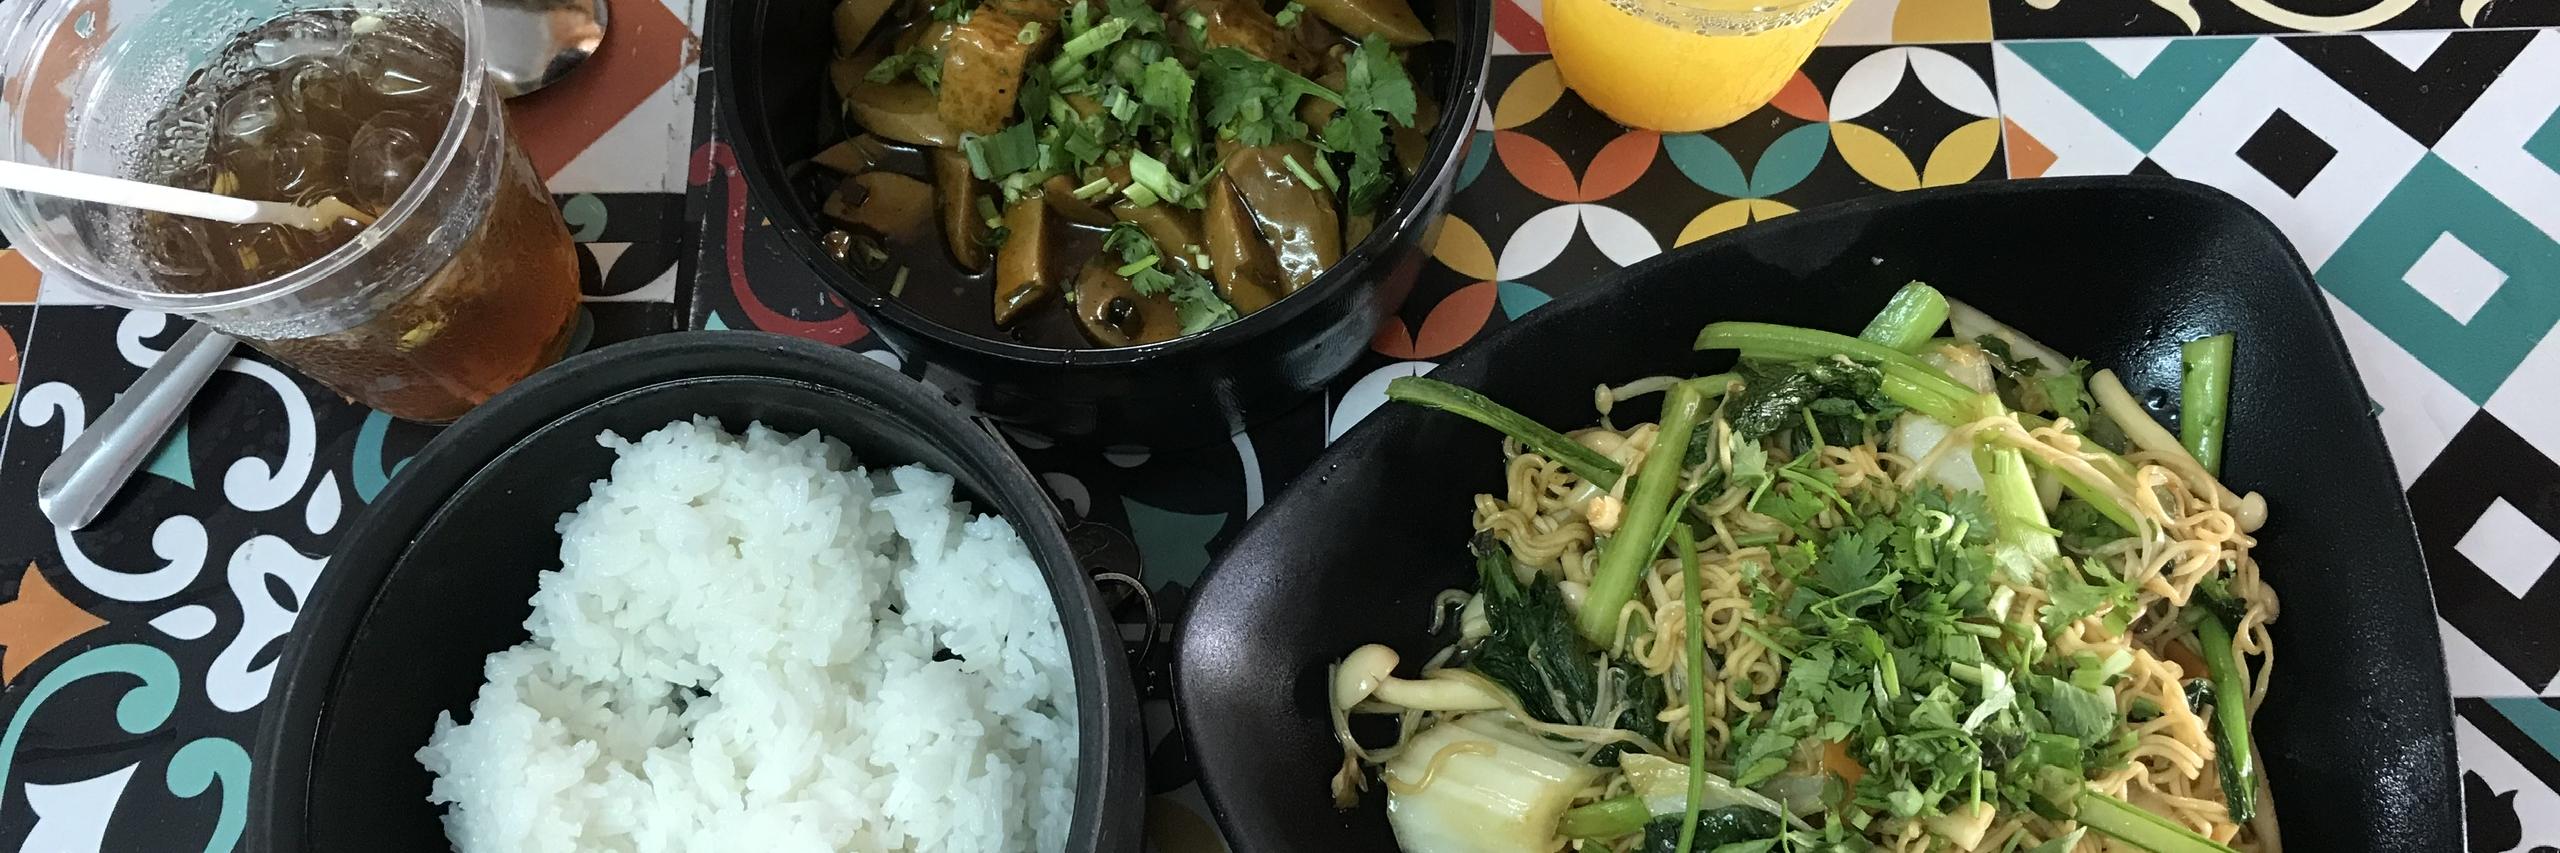 https://gody.vn/blog/congchua_mauhong803174/post/quan-chay-doi-vi-nhung-ngay-ngan-thit-o-quang-nam-8880